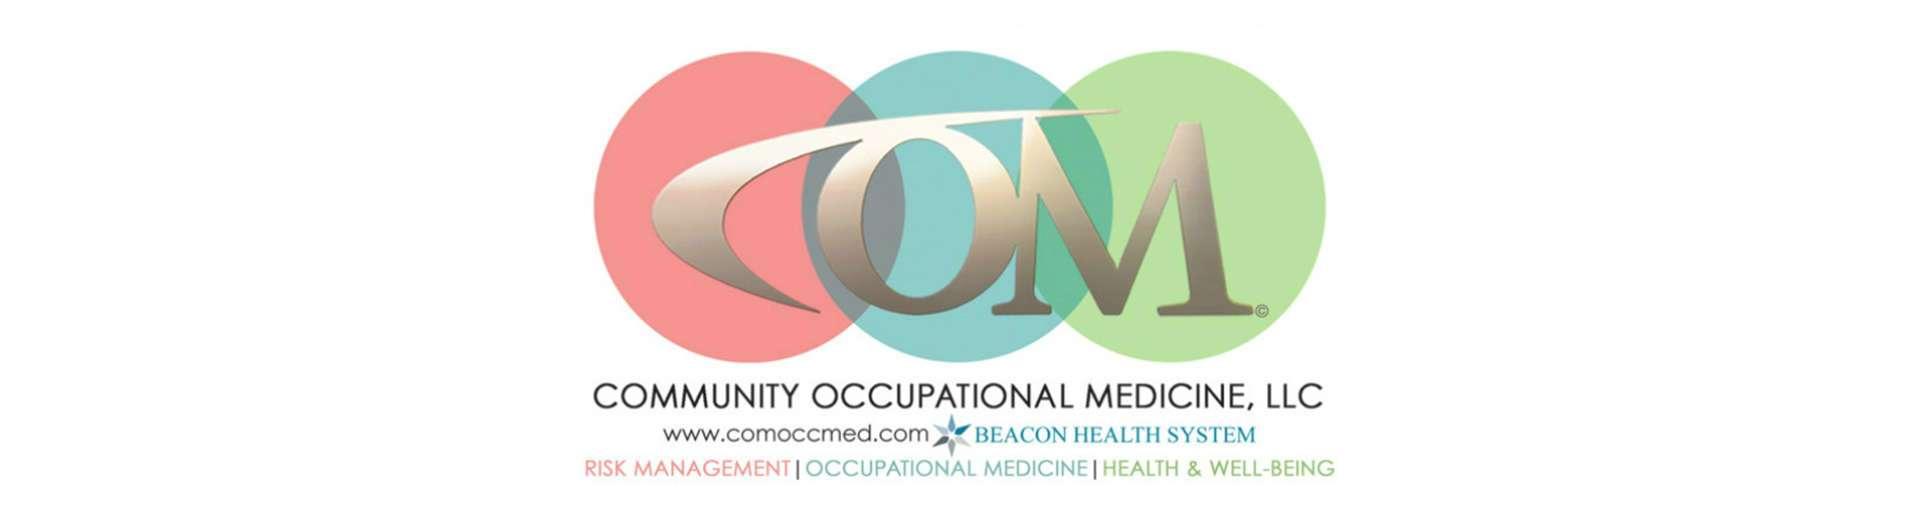 Community Occupational Medicine